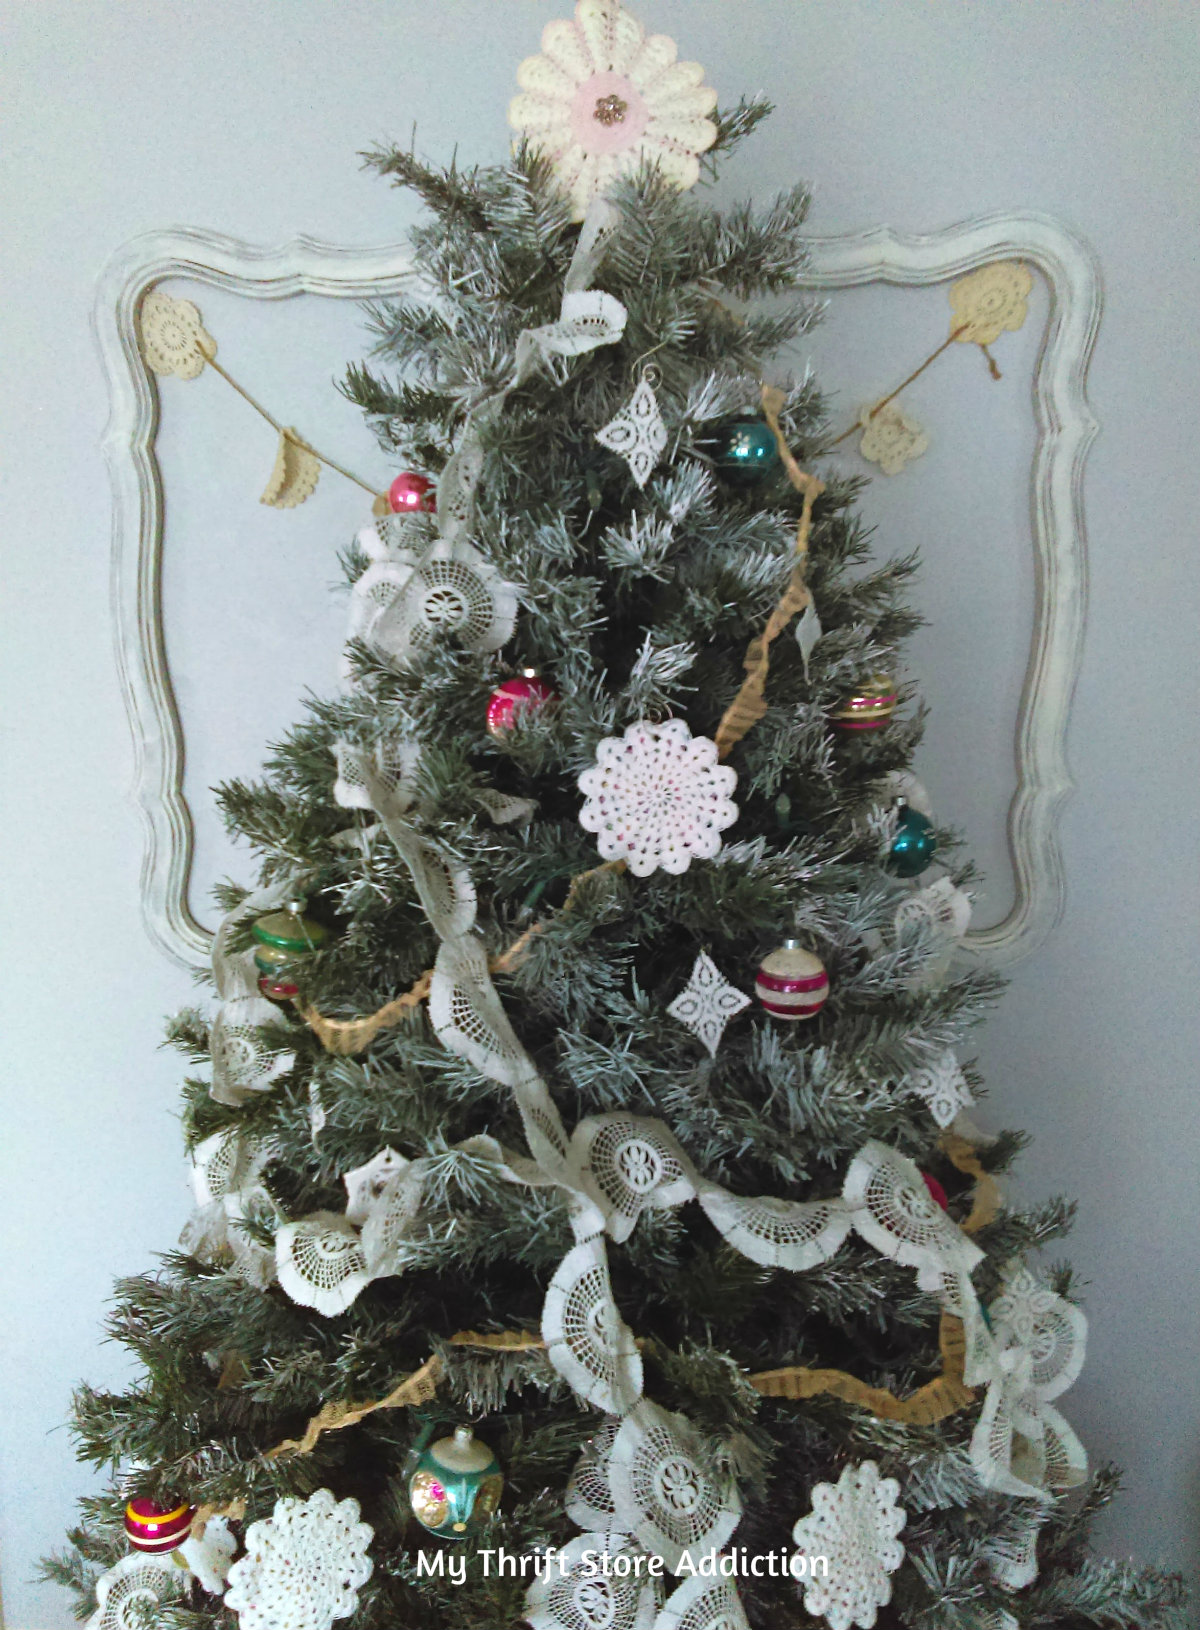 Rustic romantic Christmas decor